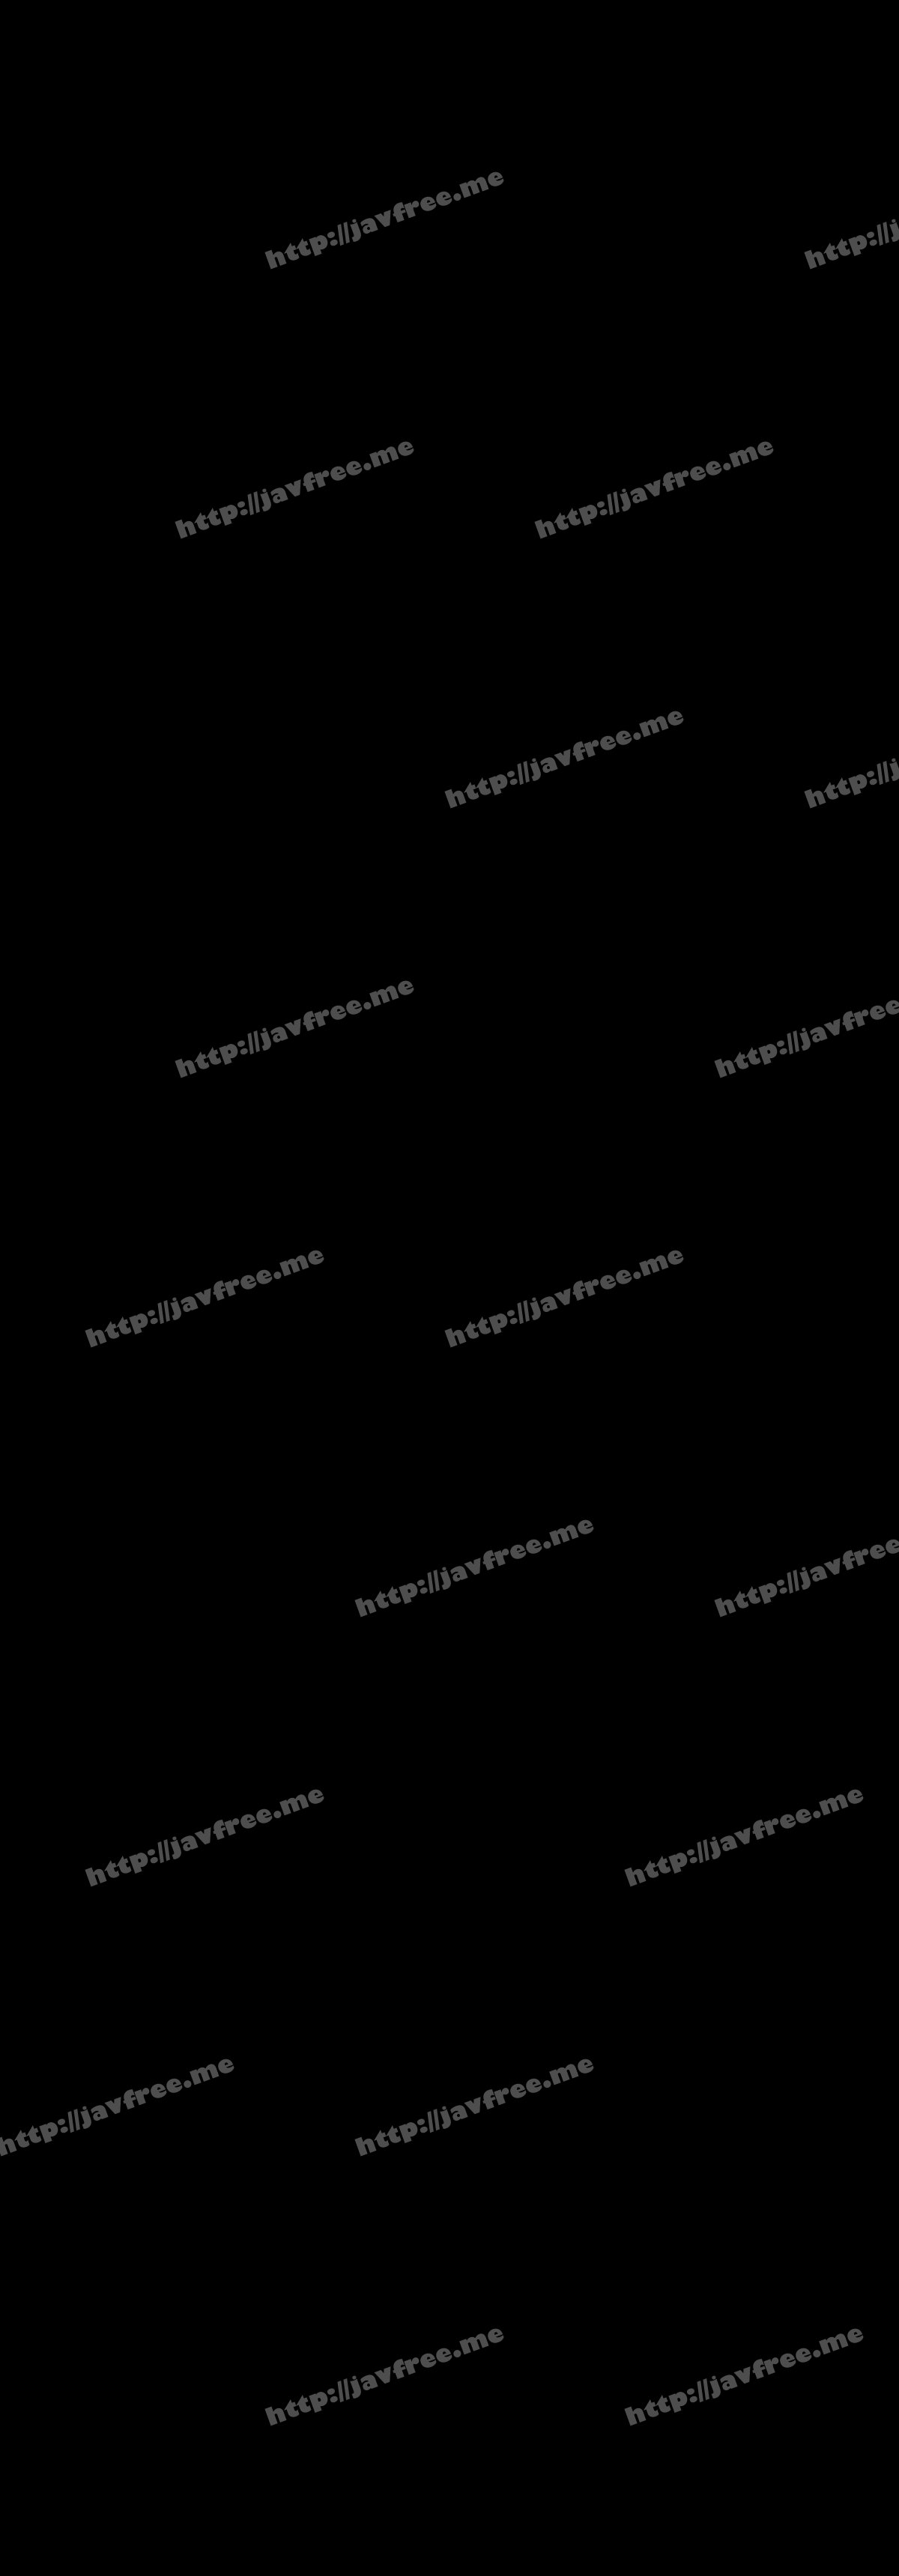 [HD][SSNI-648] 美人上司と絶倫の部下が出張先の相部屋ホテルで…いたずら誘惑を真に受けた部下が10発射精の絶倫性交 吉高寧々 - image 121319_941-1pon on https://javfree.me